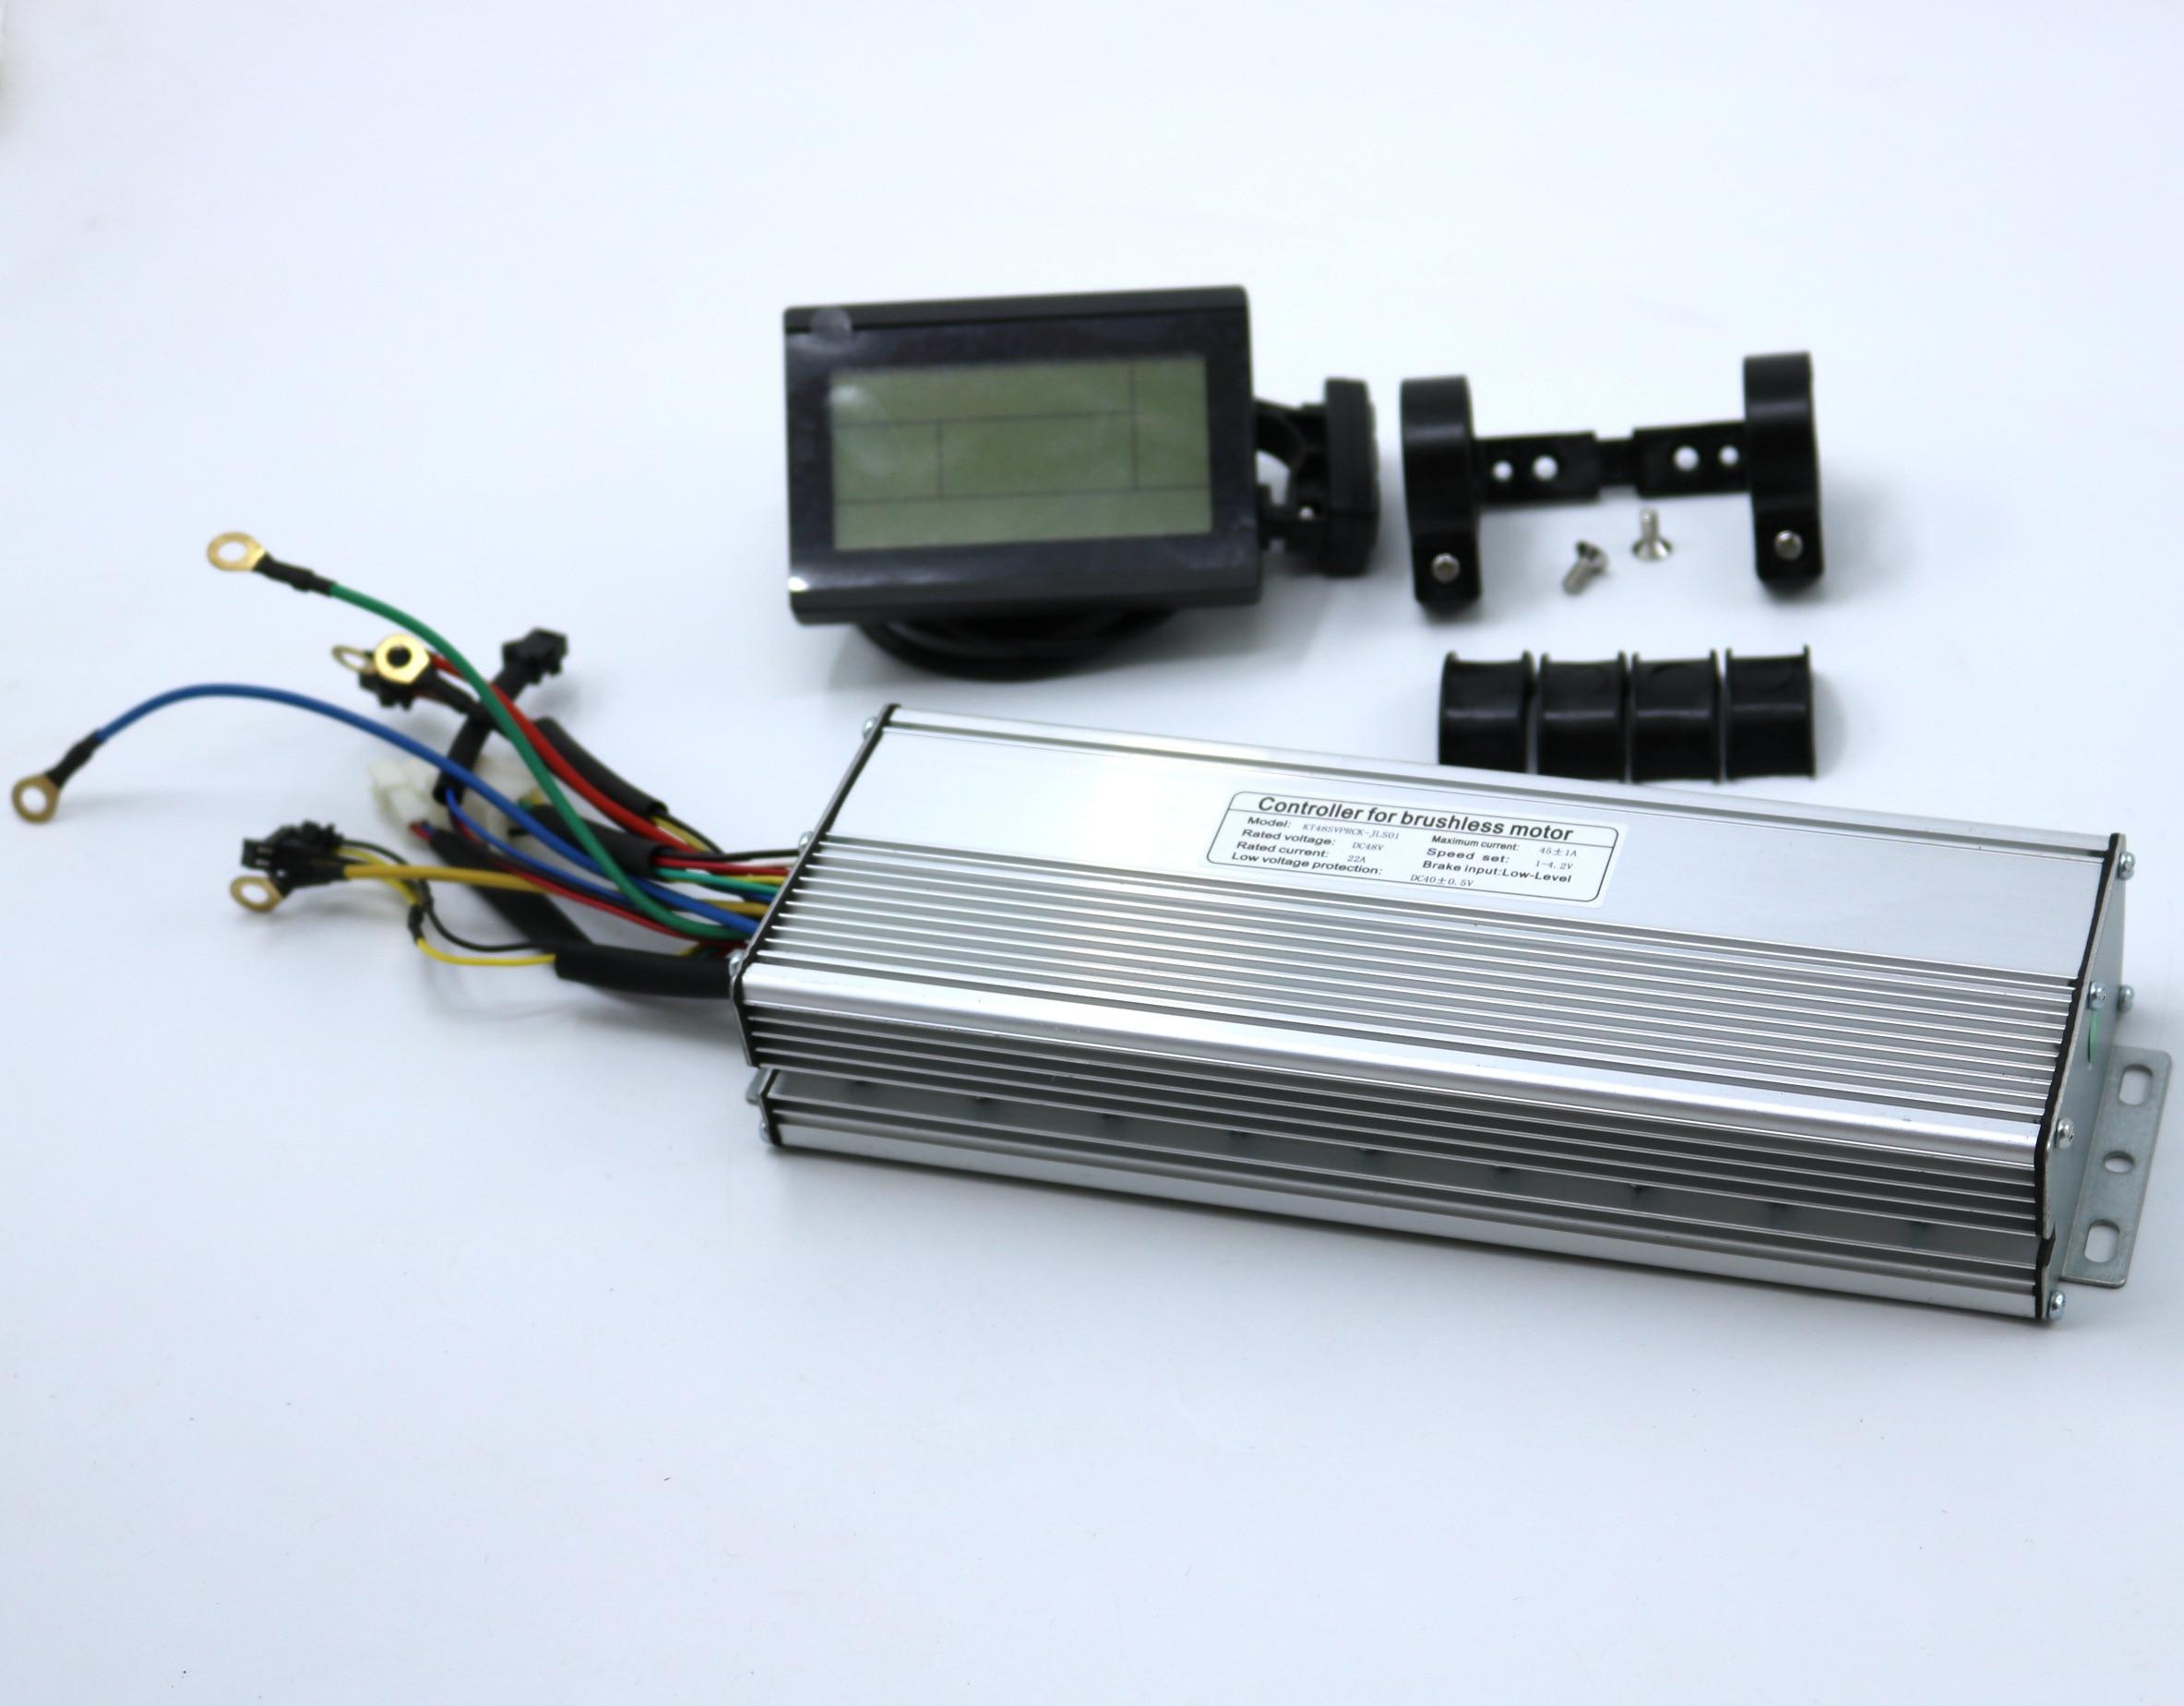 V 1500-2000W 45 48 60amax Brushless DC Controlador Do Motor Ebike LCD3 KUNTENG Display LCD Controlador + KT-LCD3 um Conjunto